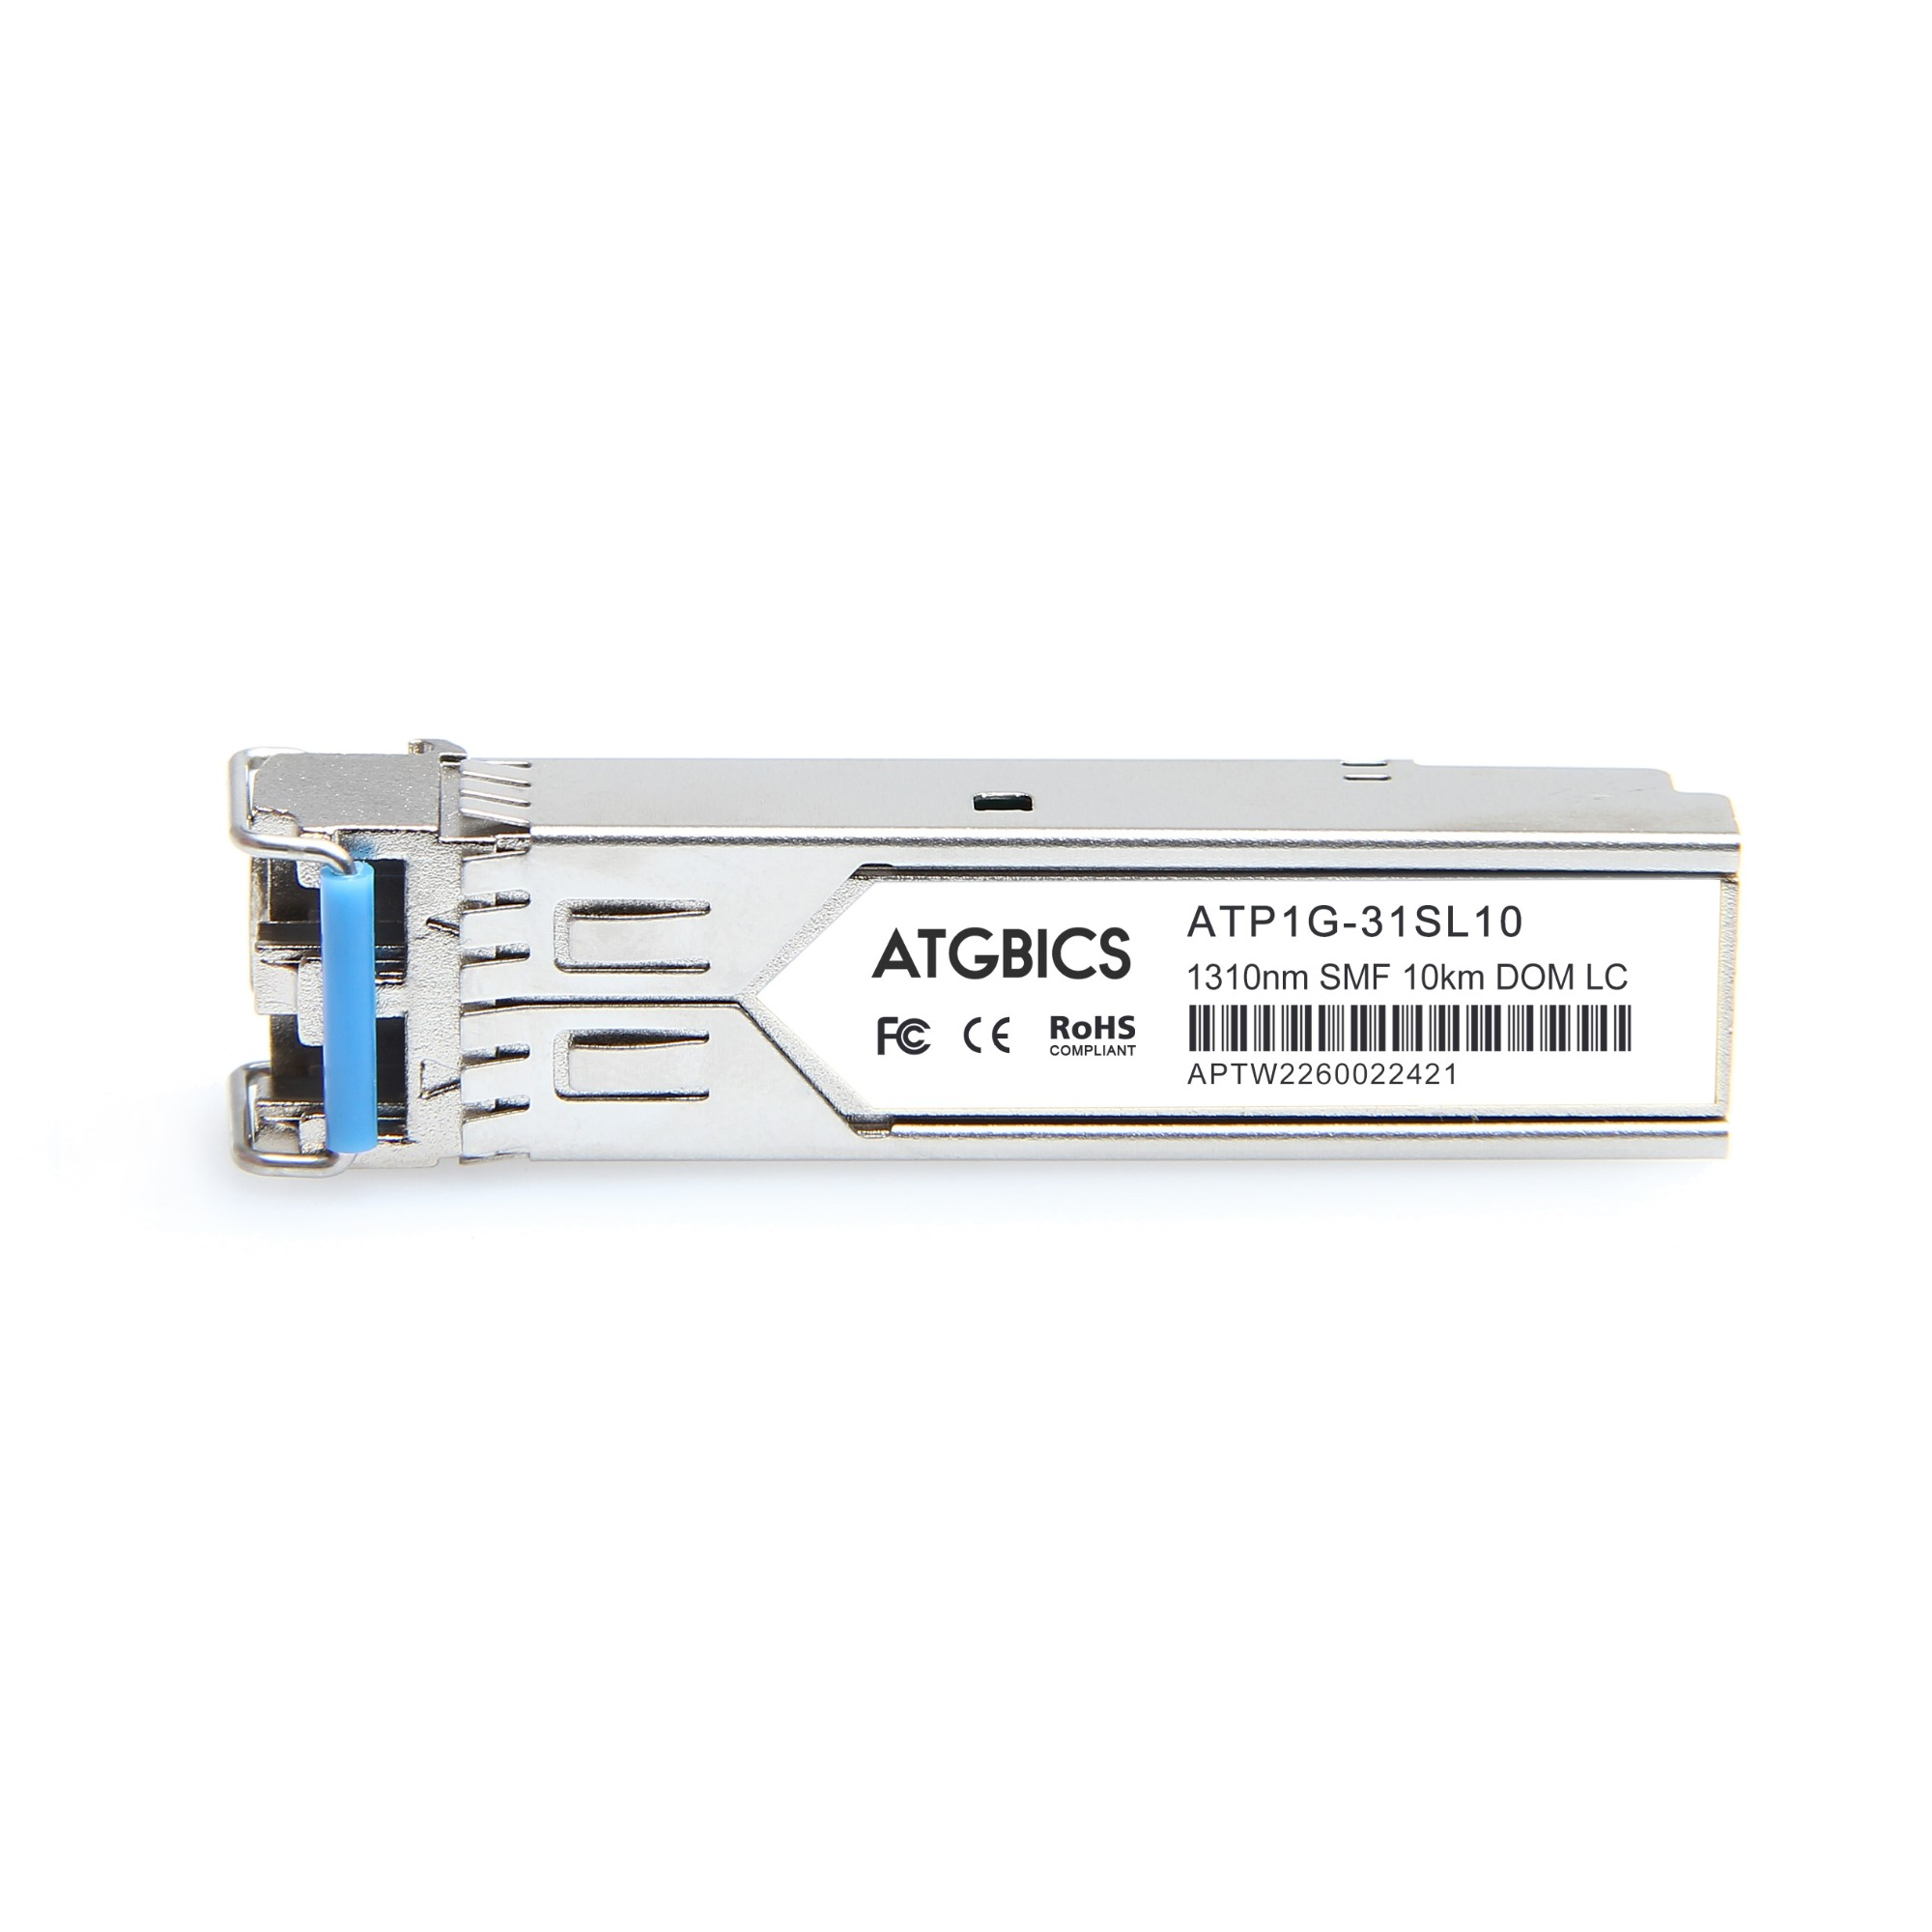 Image of ATGBICS CPAC-TR-1LX-SSM160-SFP-C network transceiver module Fiber optic 1000 Mbit/s 1310 nm